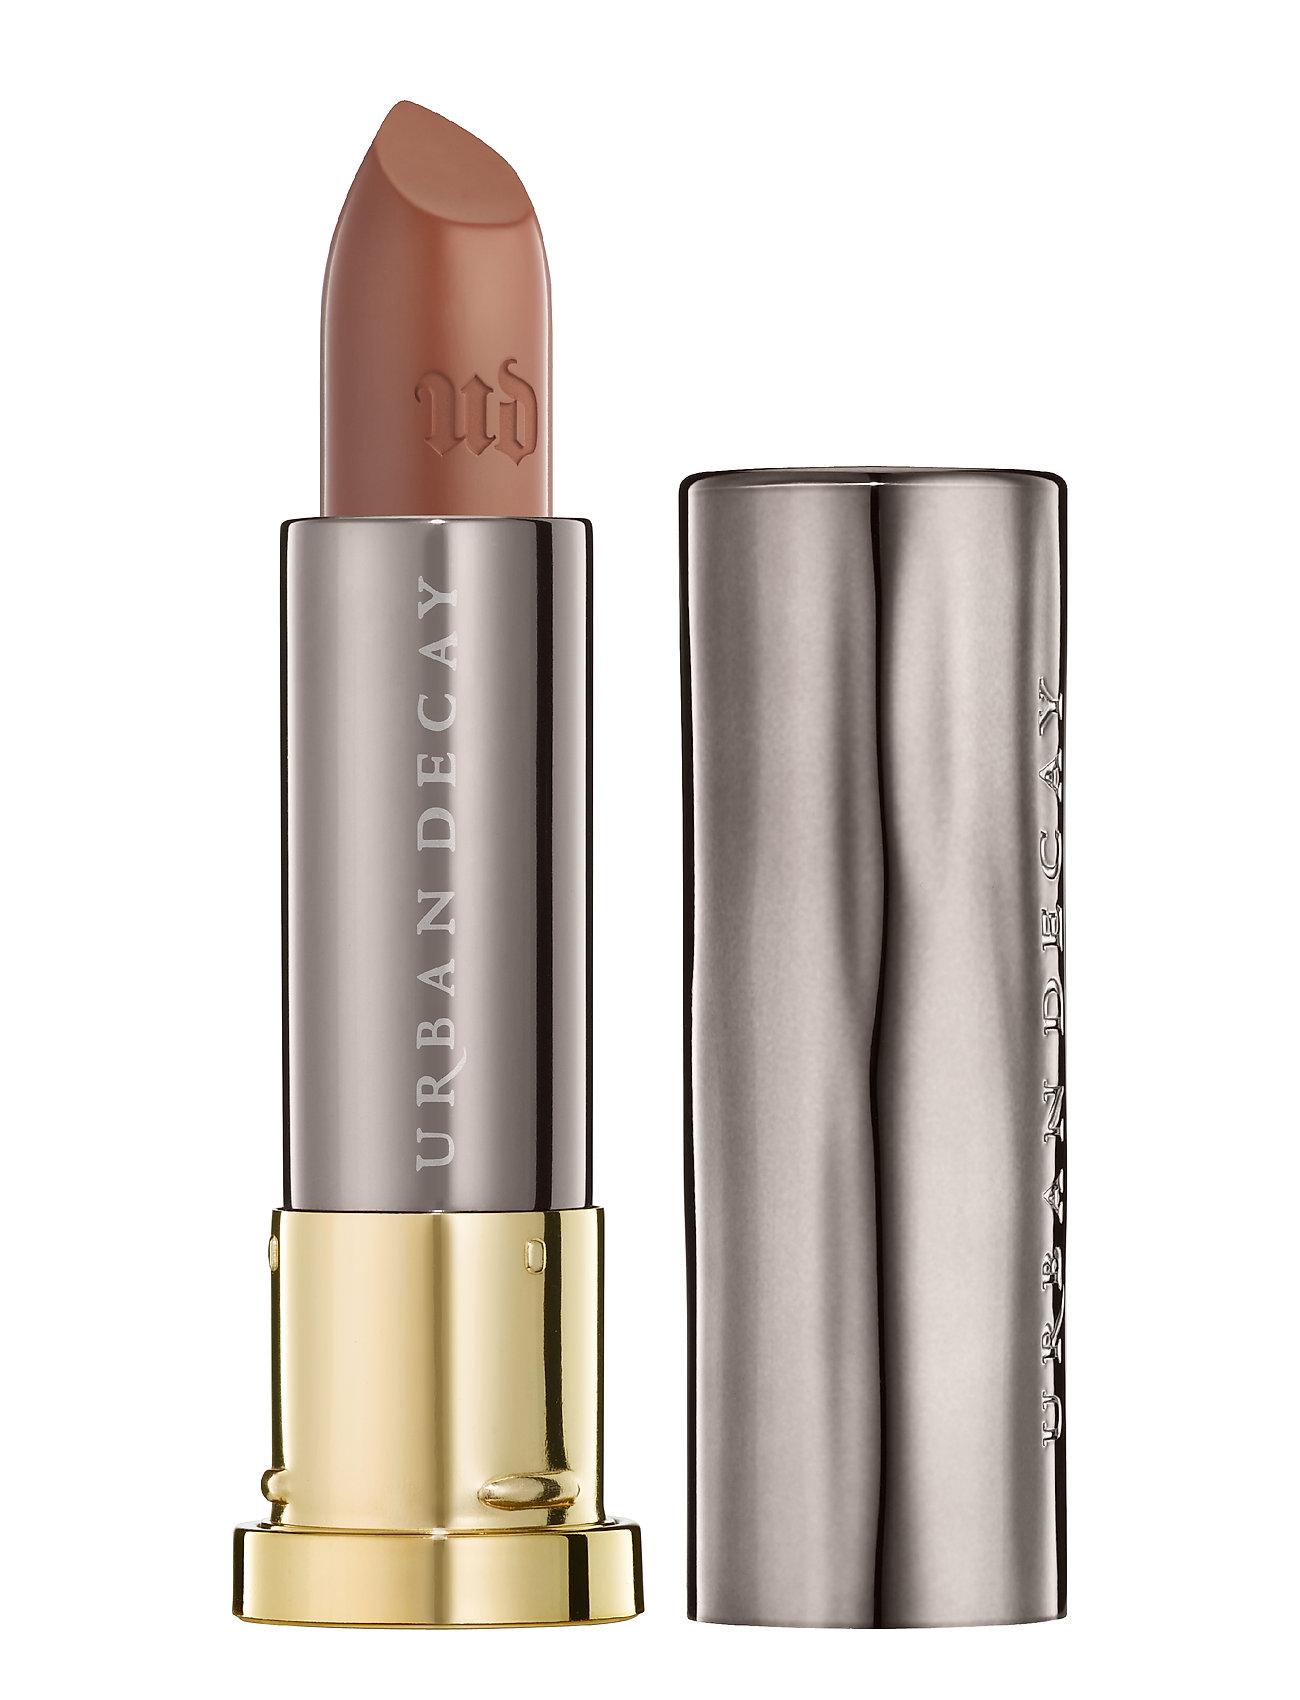 Image of Vice Lipstick Læbestift Makeup Multi/mønstret Urban Decay (3067523469)